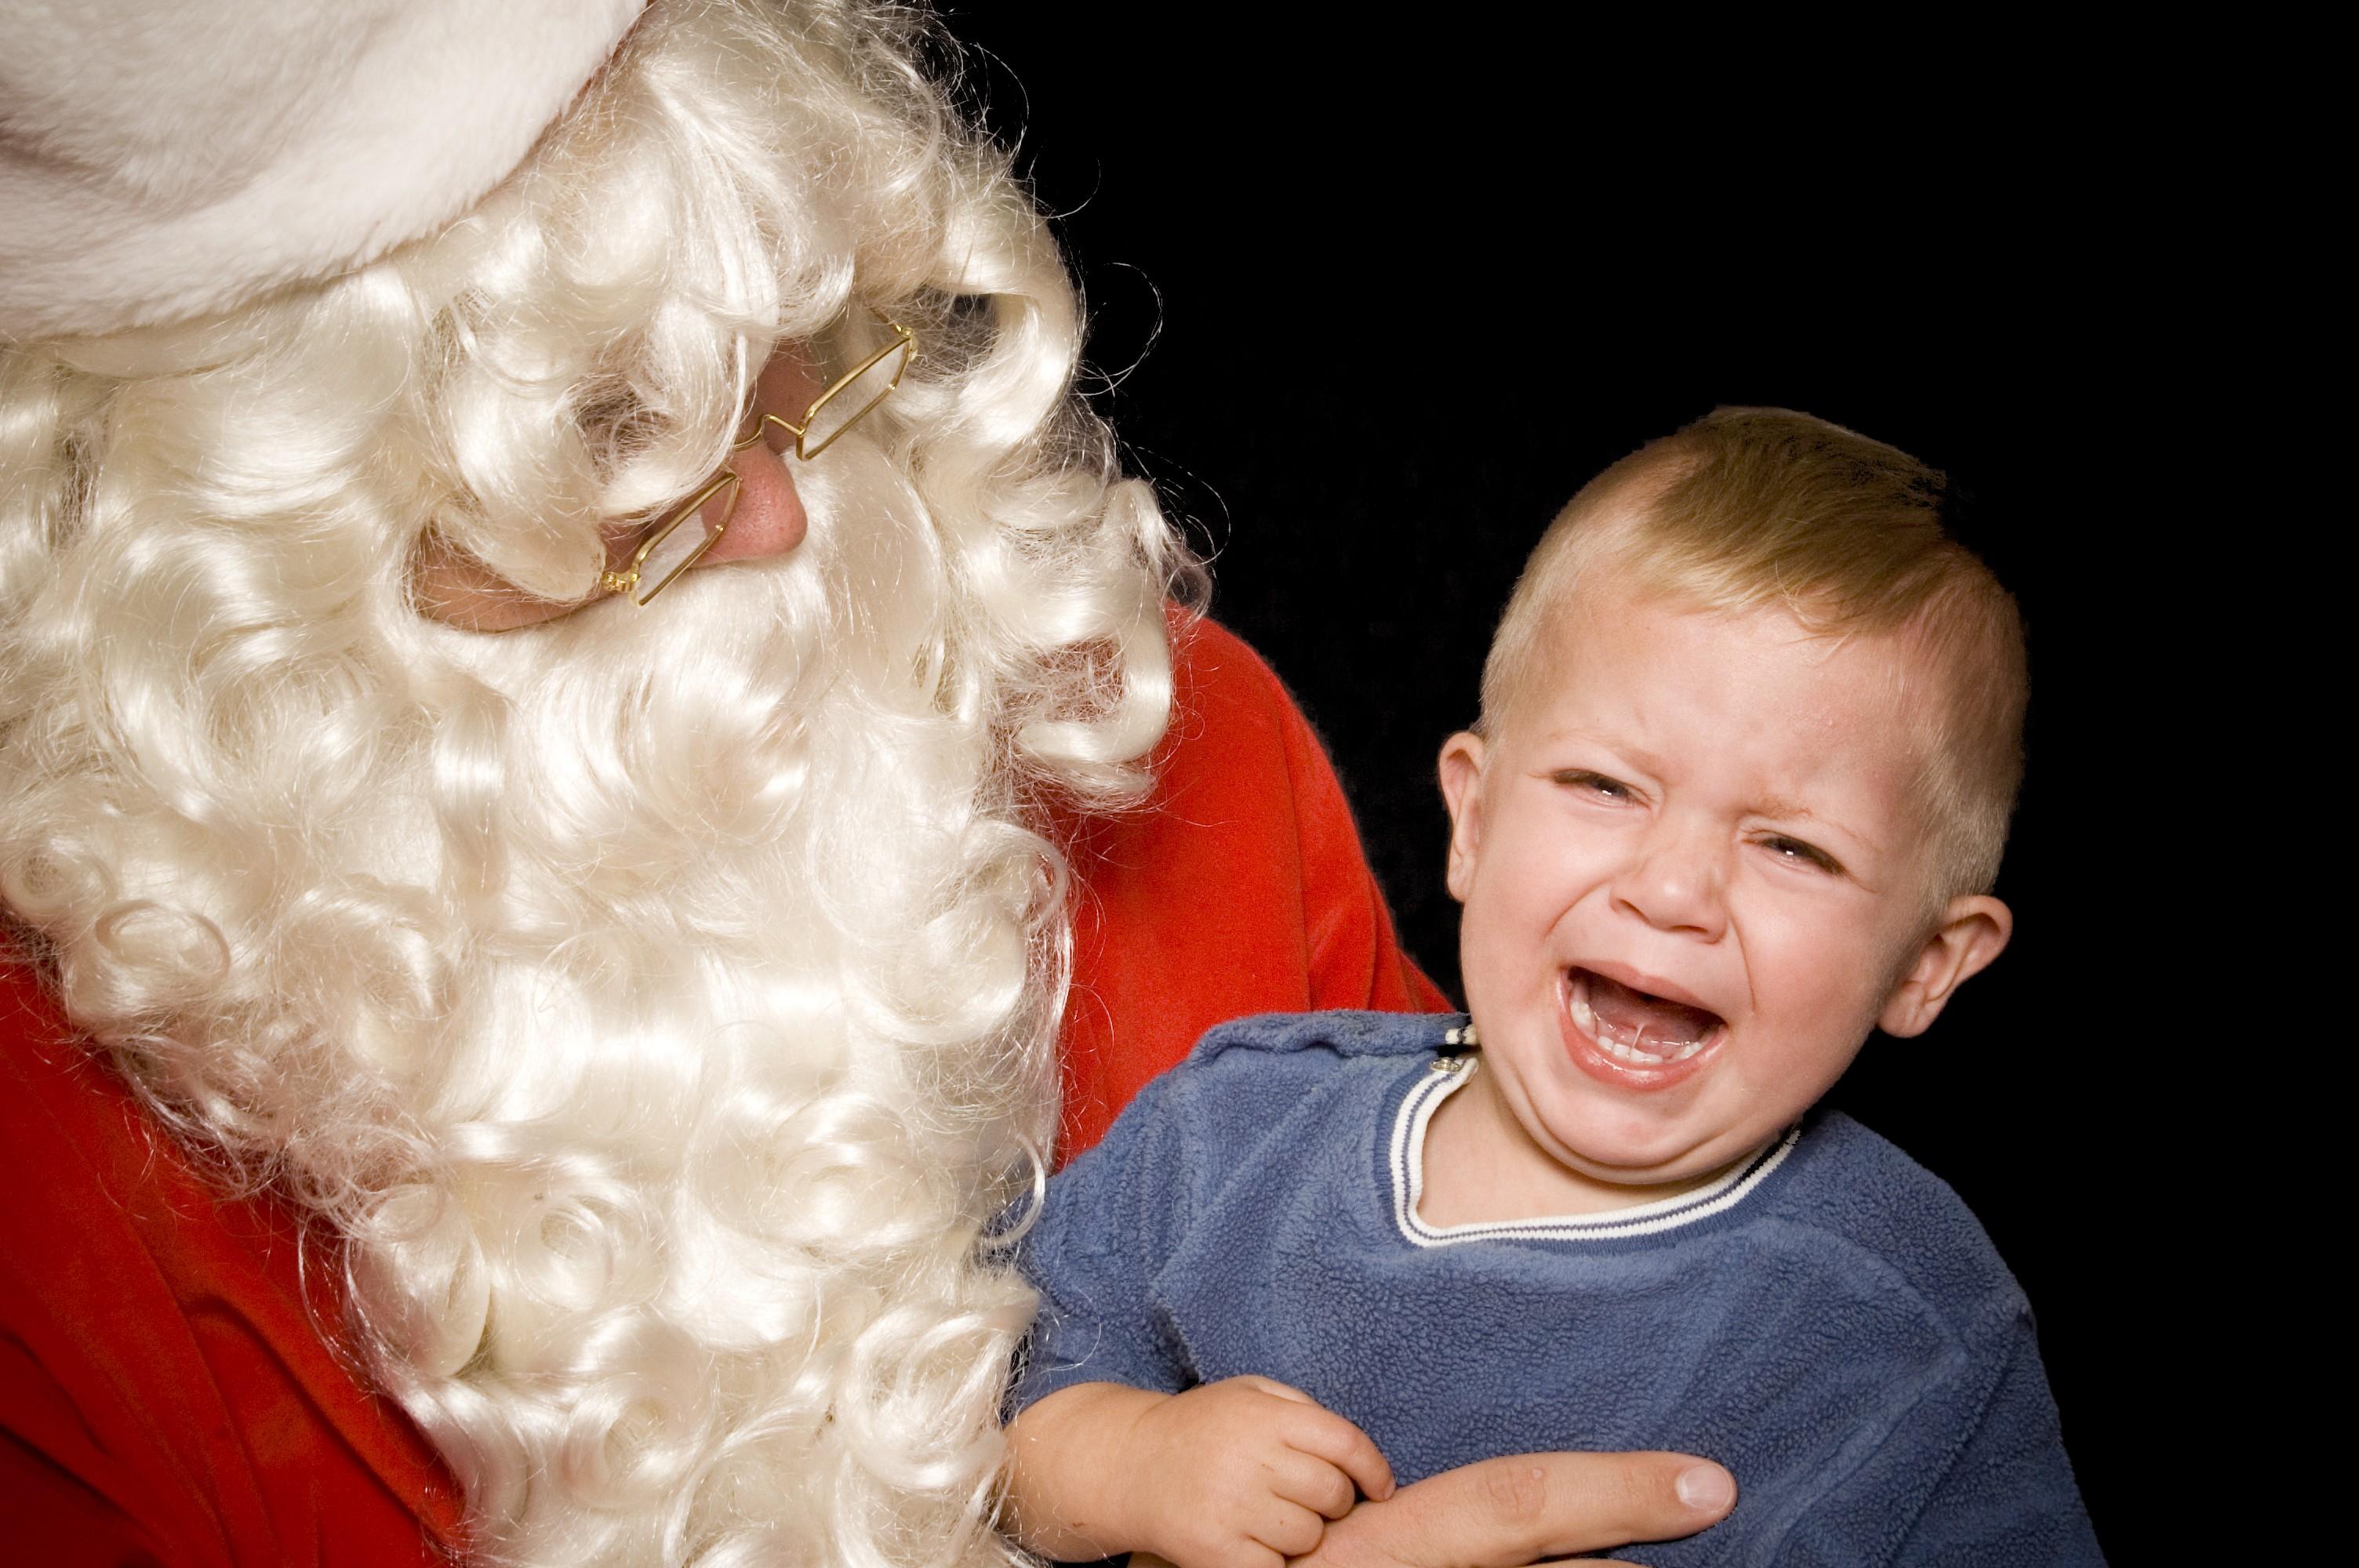 Medo de Papai Noel (Foto: Thinkstock)